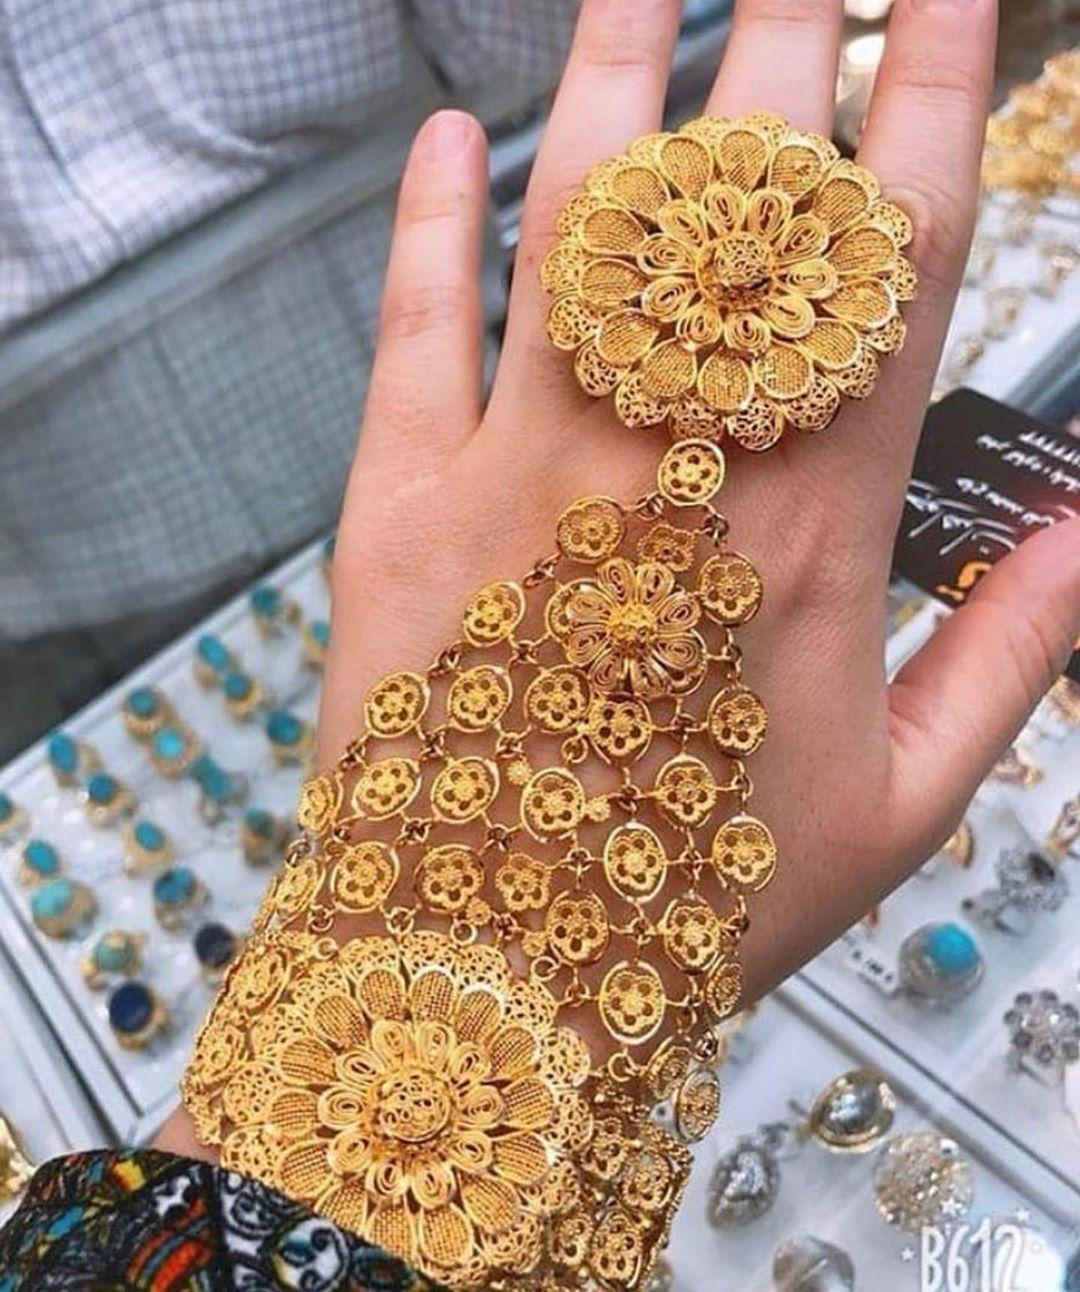 رايكم Your Opinion Golden Star010 الراعي الرسمي للحساب مجوهر Gold Jewelry Fashion Gold Bangles Design Bridal Gold Jewellery